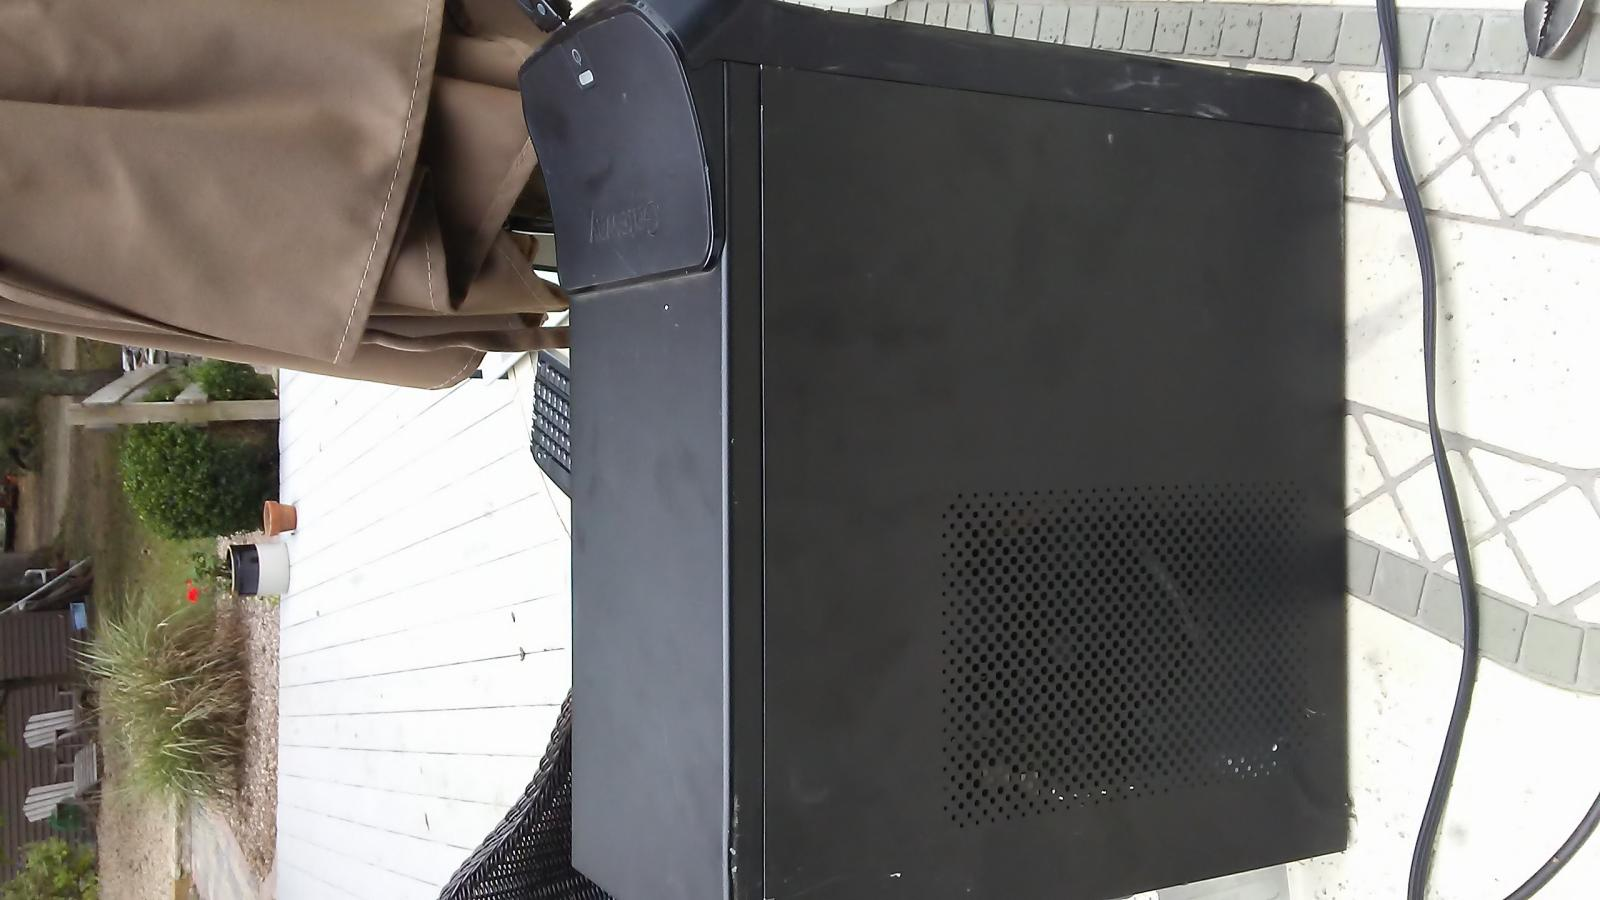 Photo of gateway desktop core i5 3330 1 tb hard drive 8gb ddr3